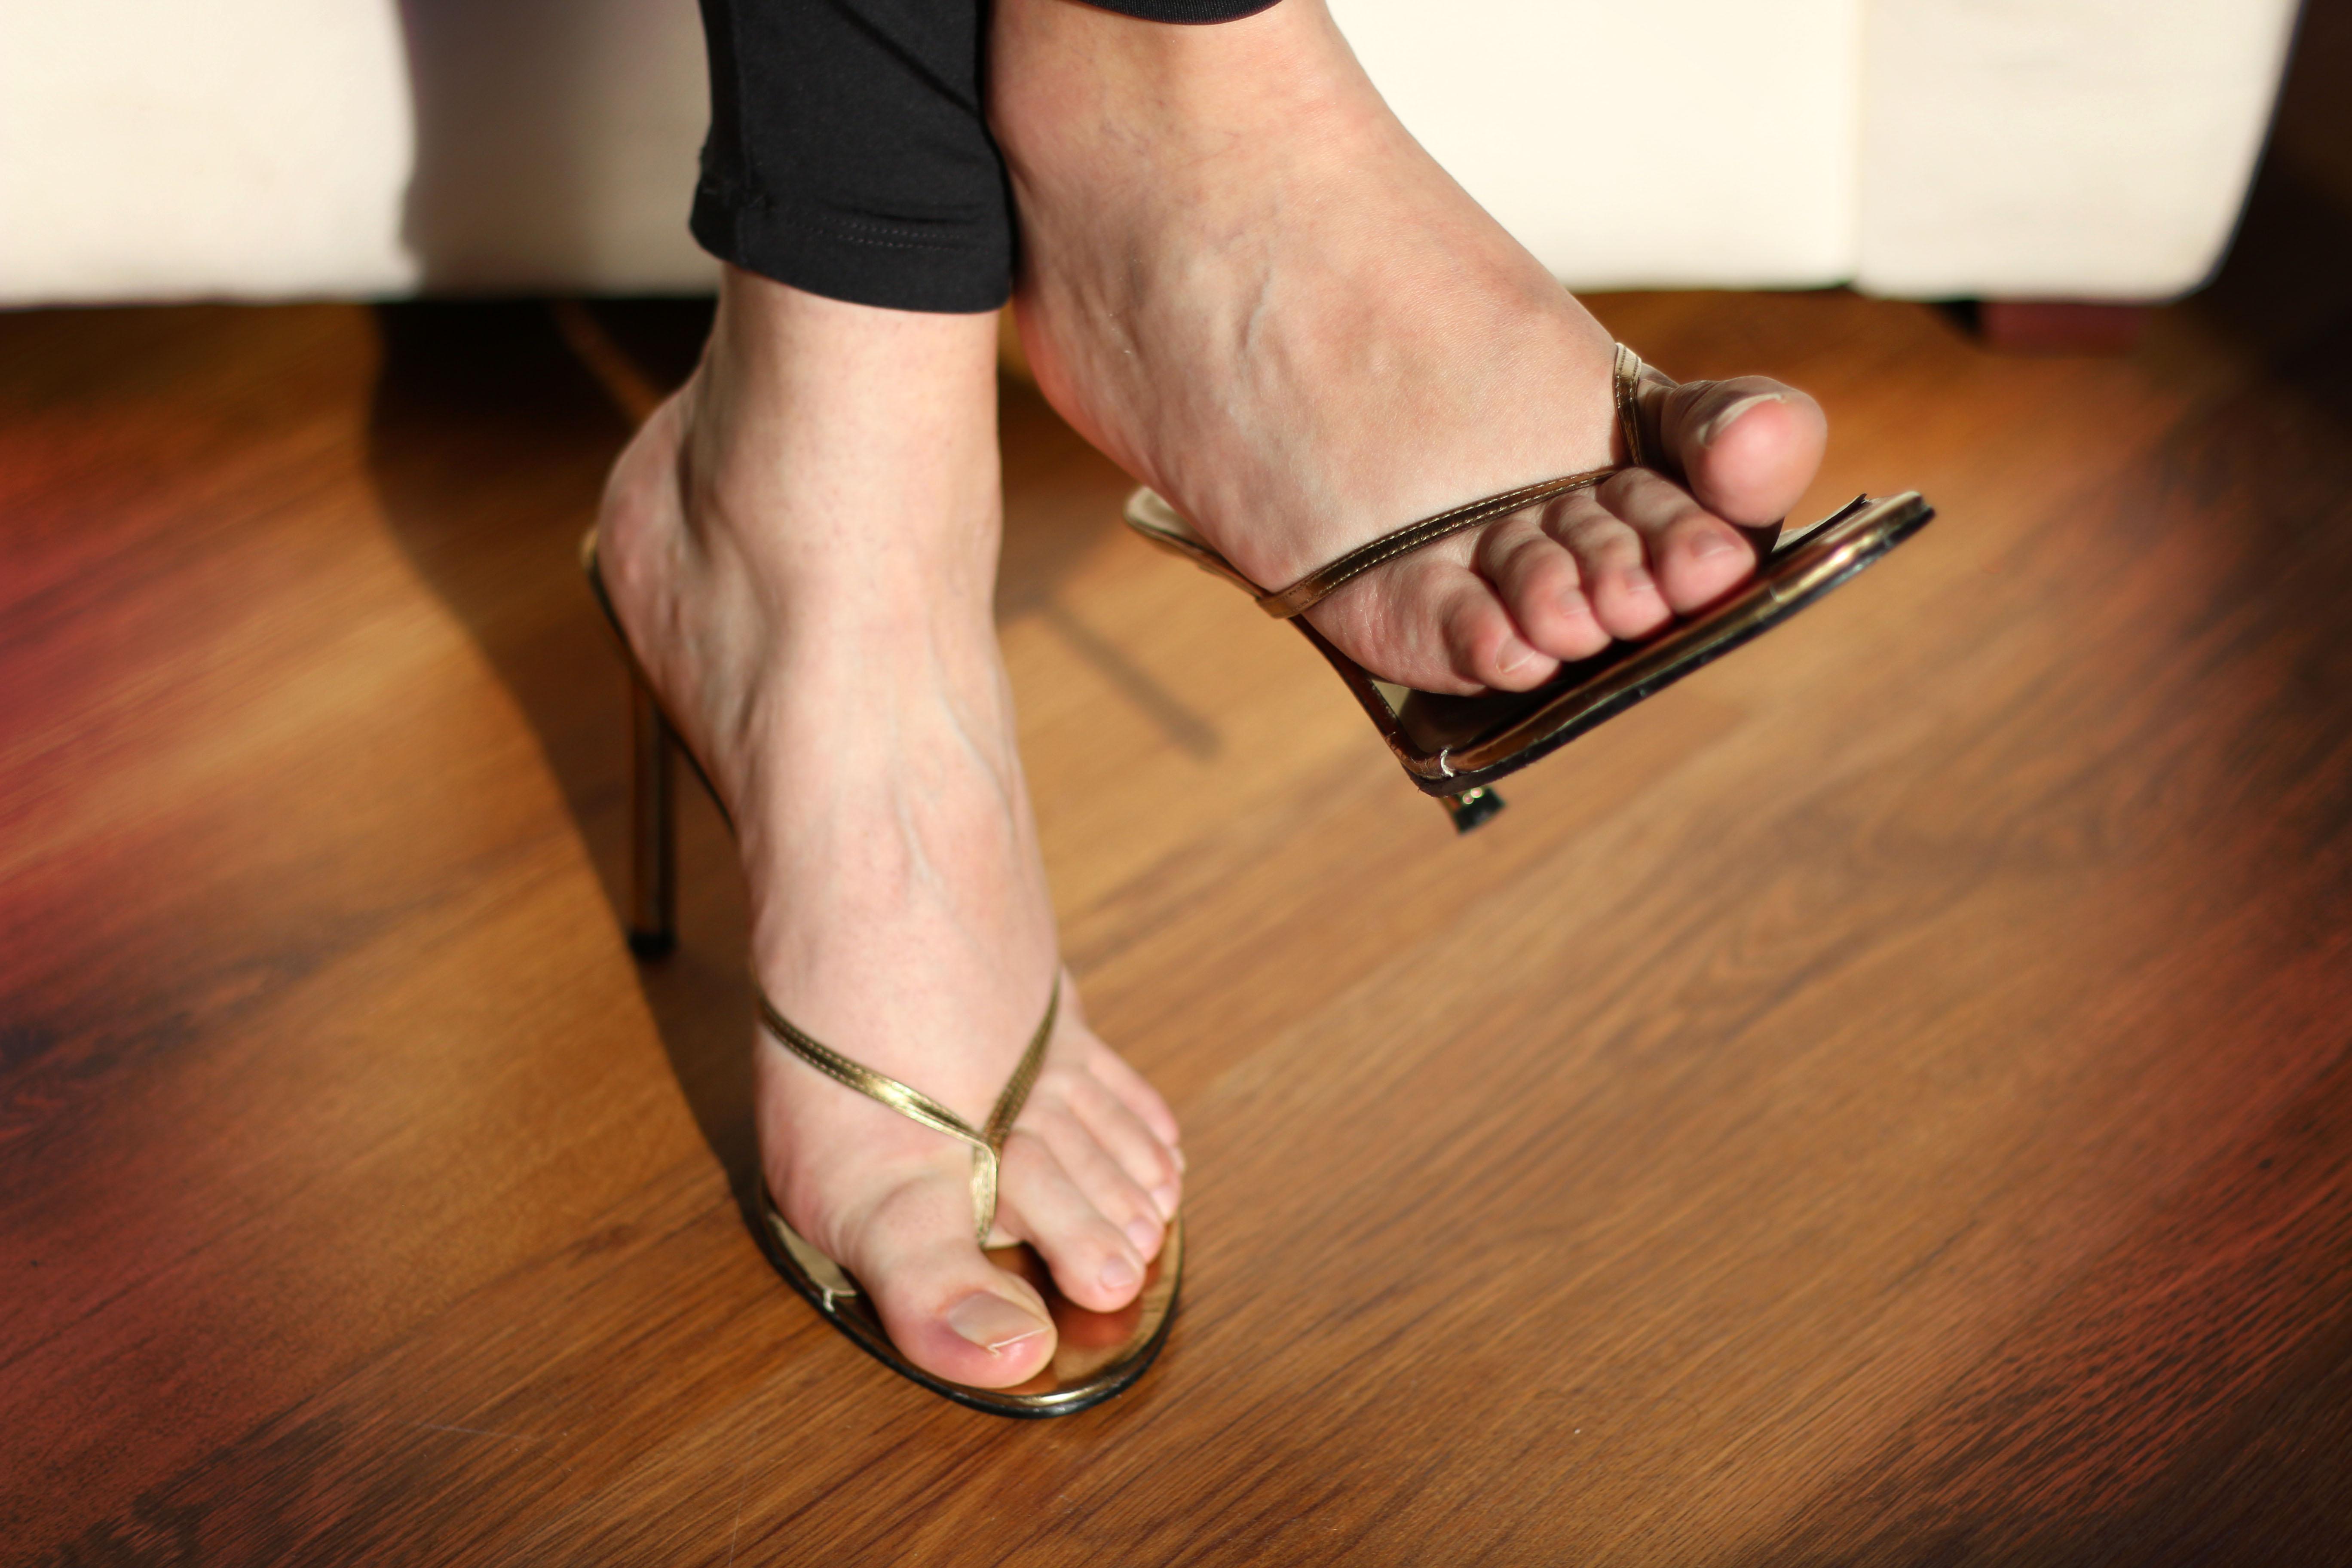 Sexy feet in high heel sandals